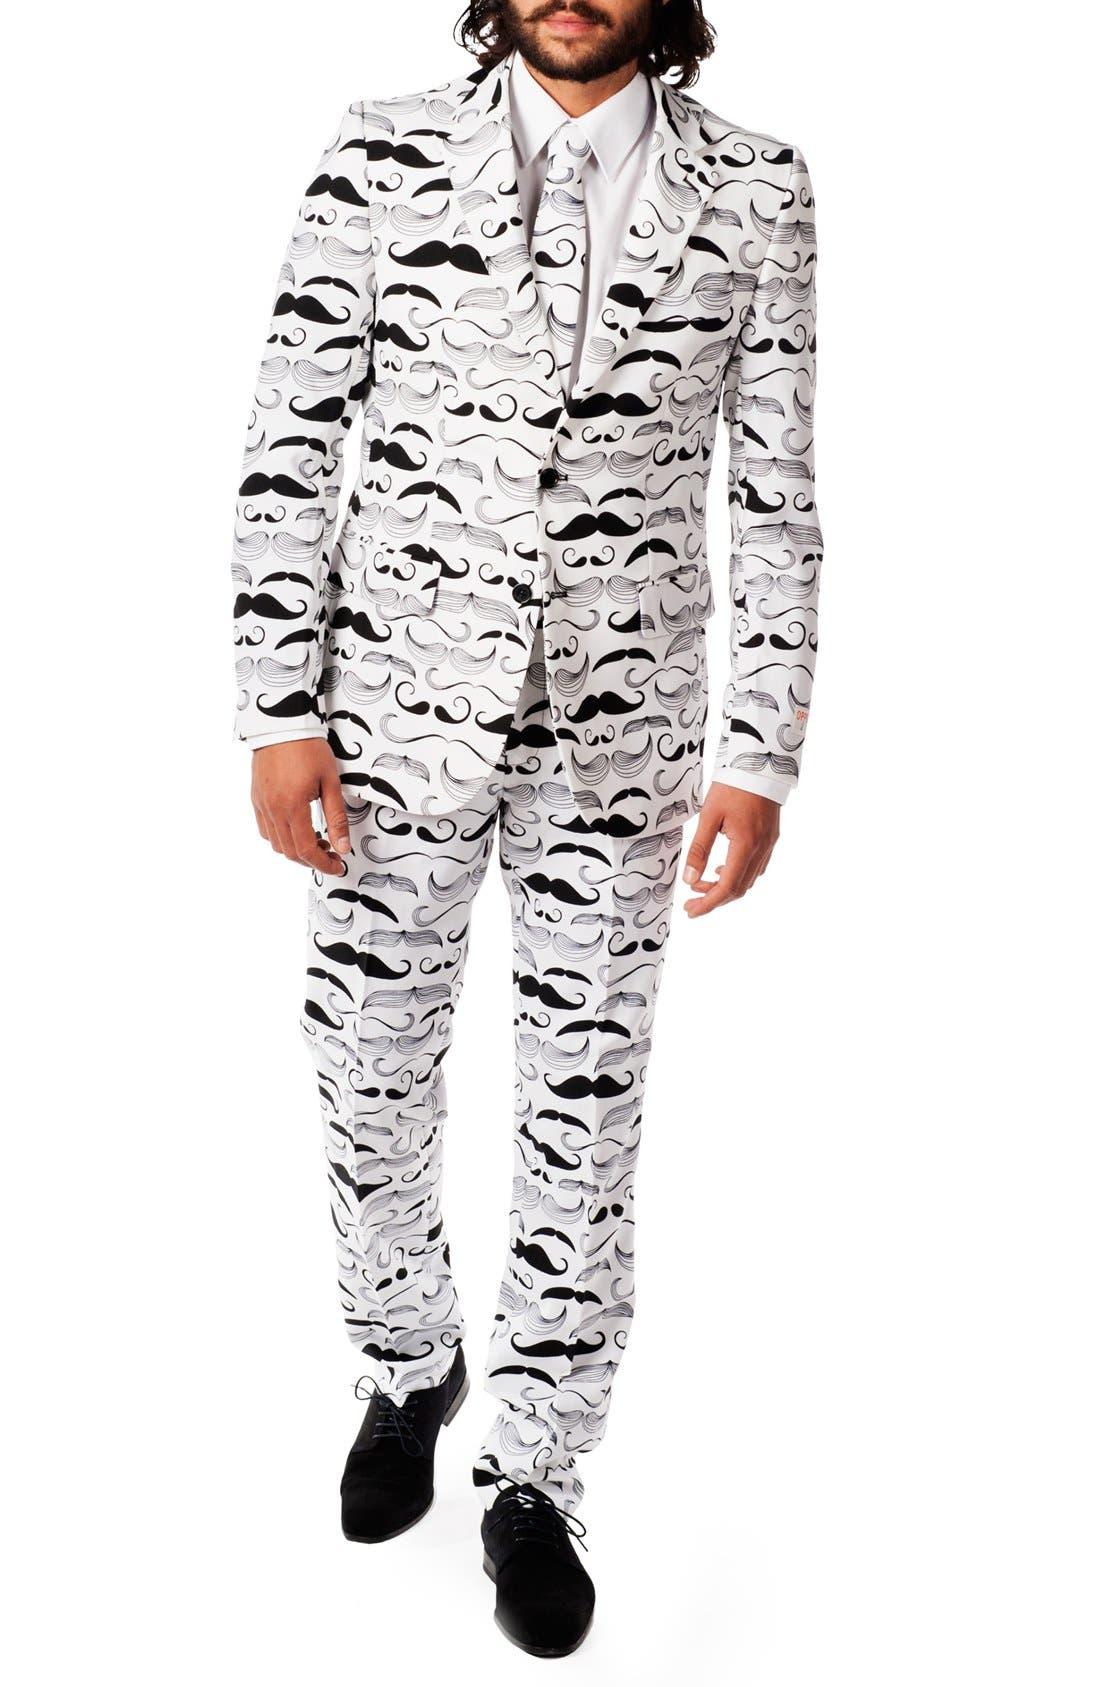 Main Image - OppoSuits 'Tashtastic' Trim Fit Two-Piece Suit with Tie